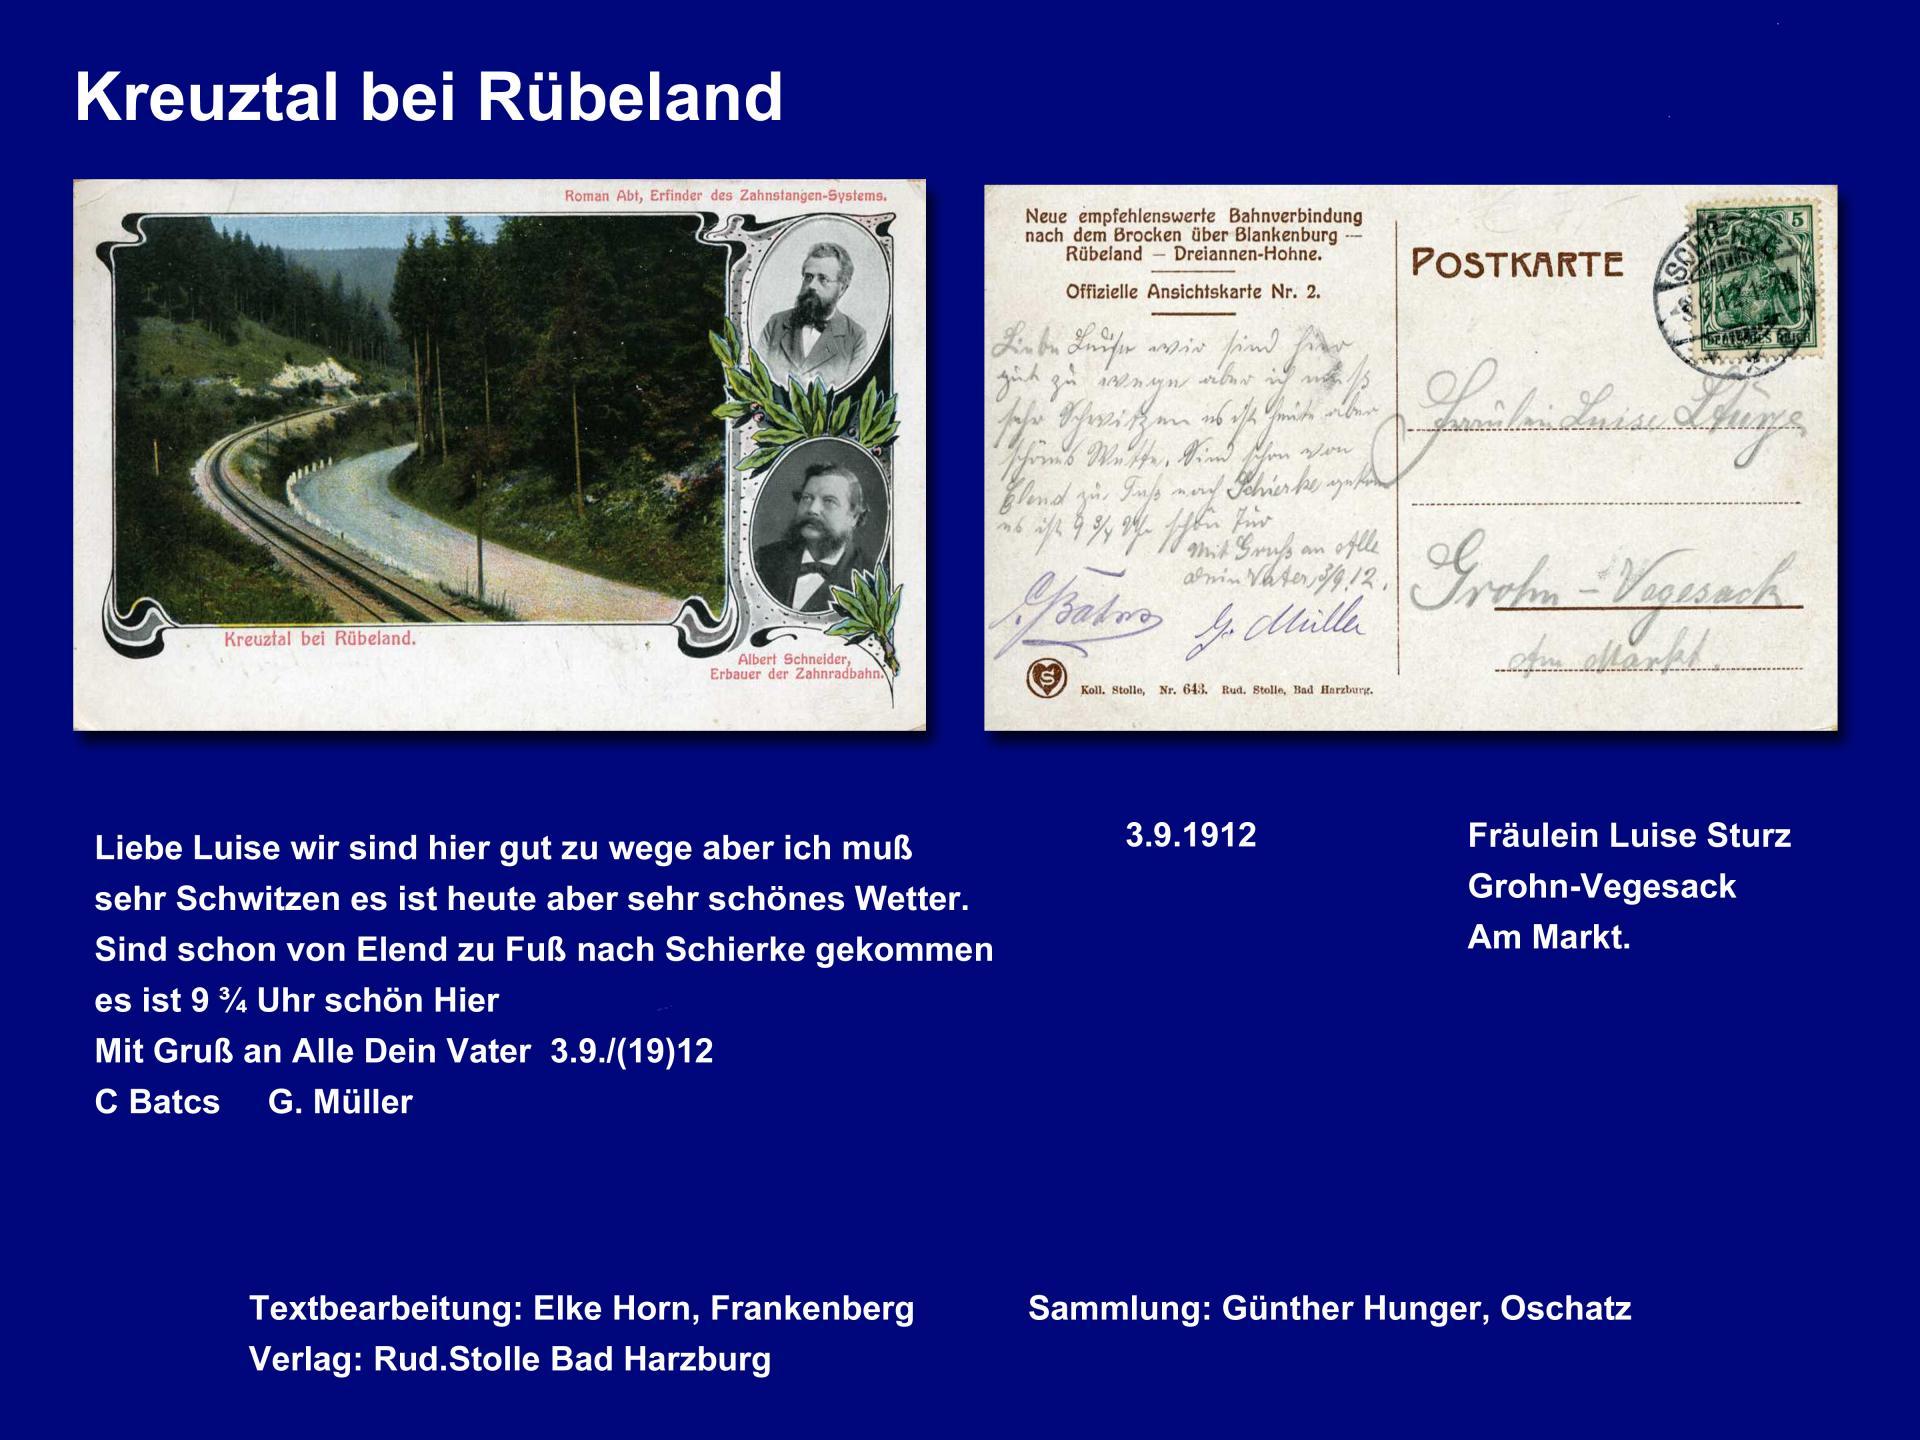 Kreuztal bei Rübeland